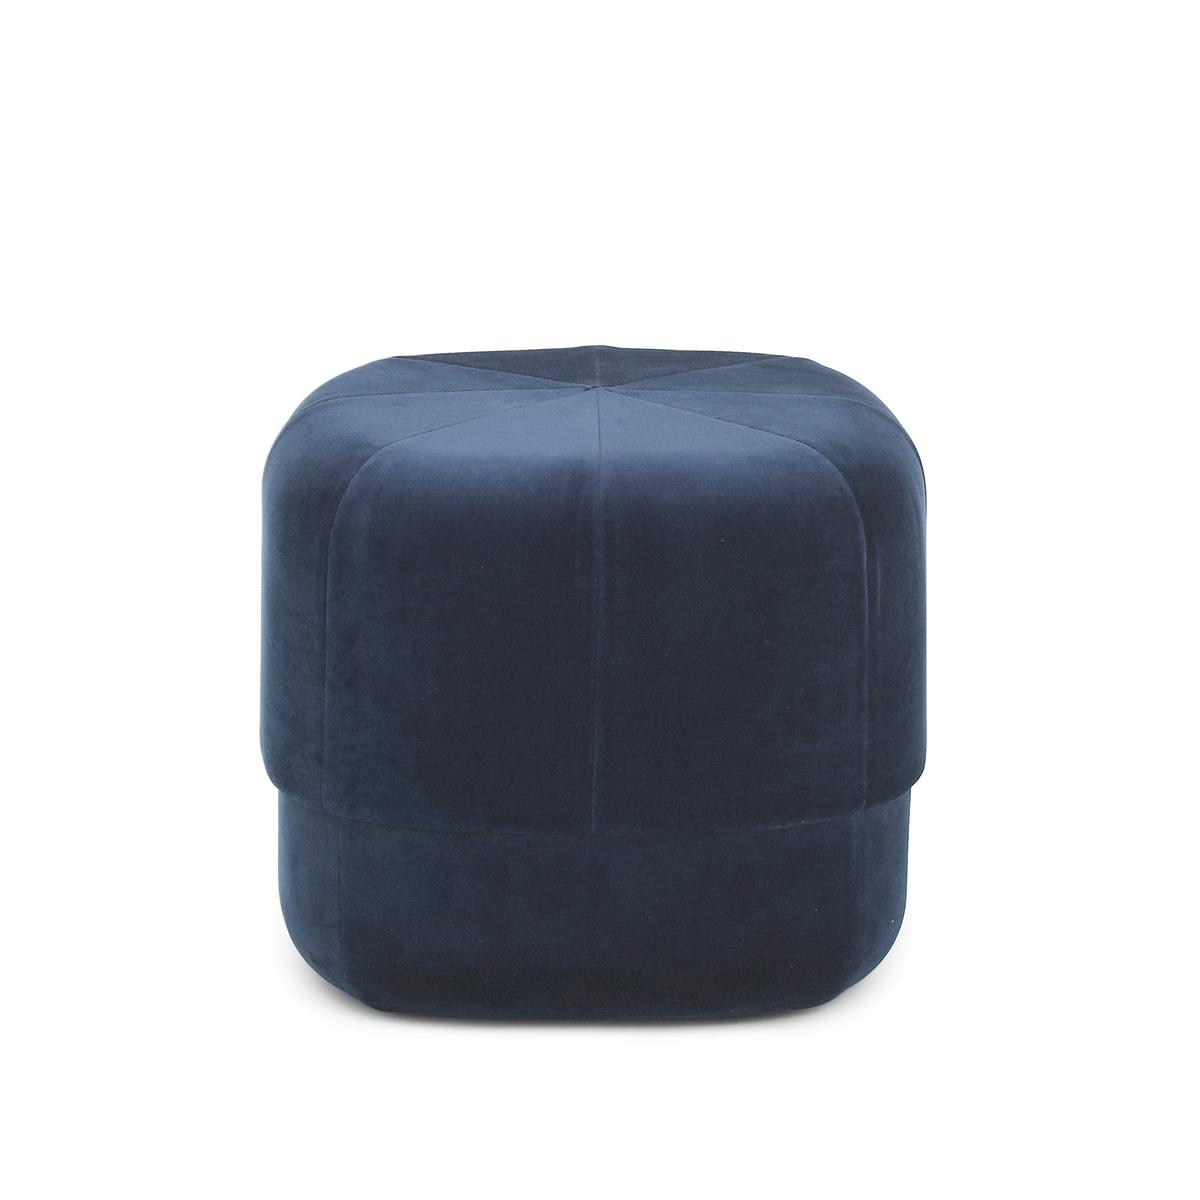 Normann copenhagen circus pouf small dark blue velour